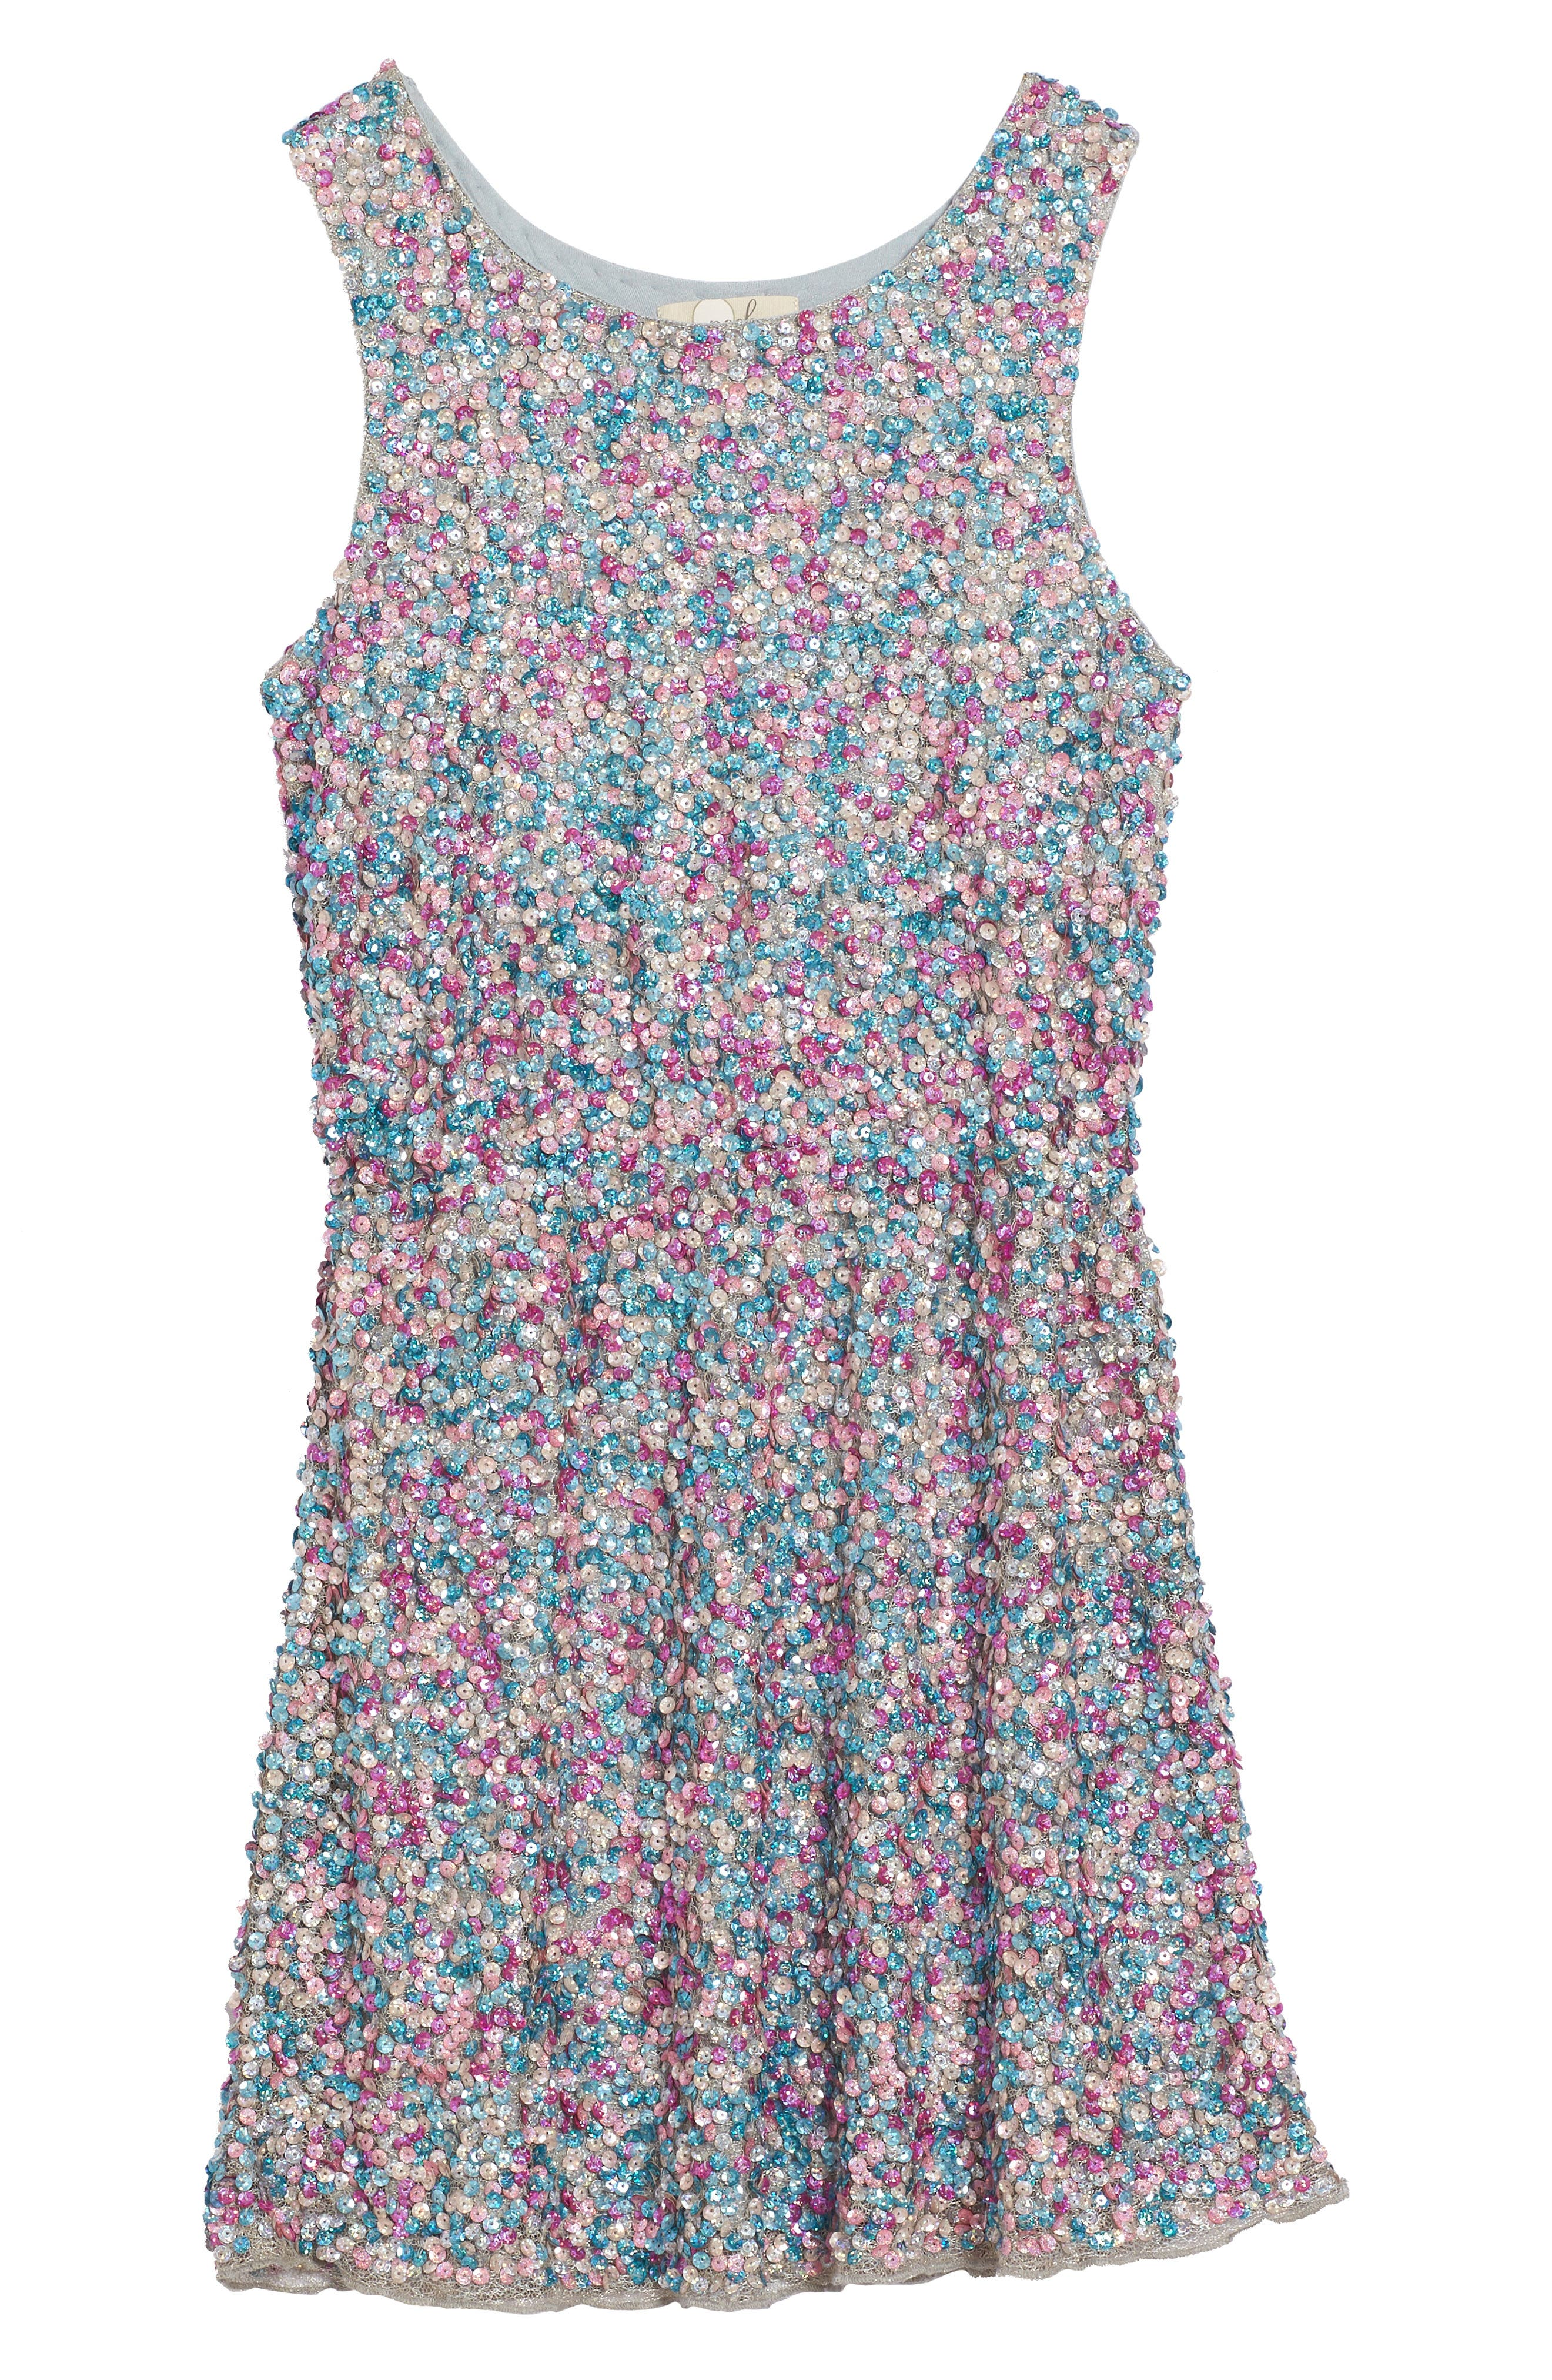 Zoe Sequin Dress,                             Main thumbnail 1, color,                             400